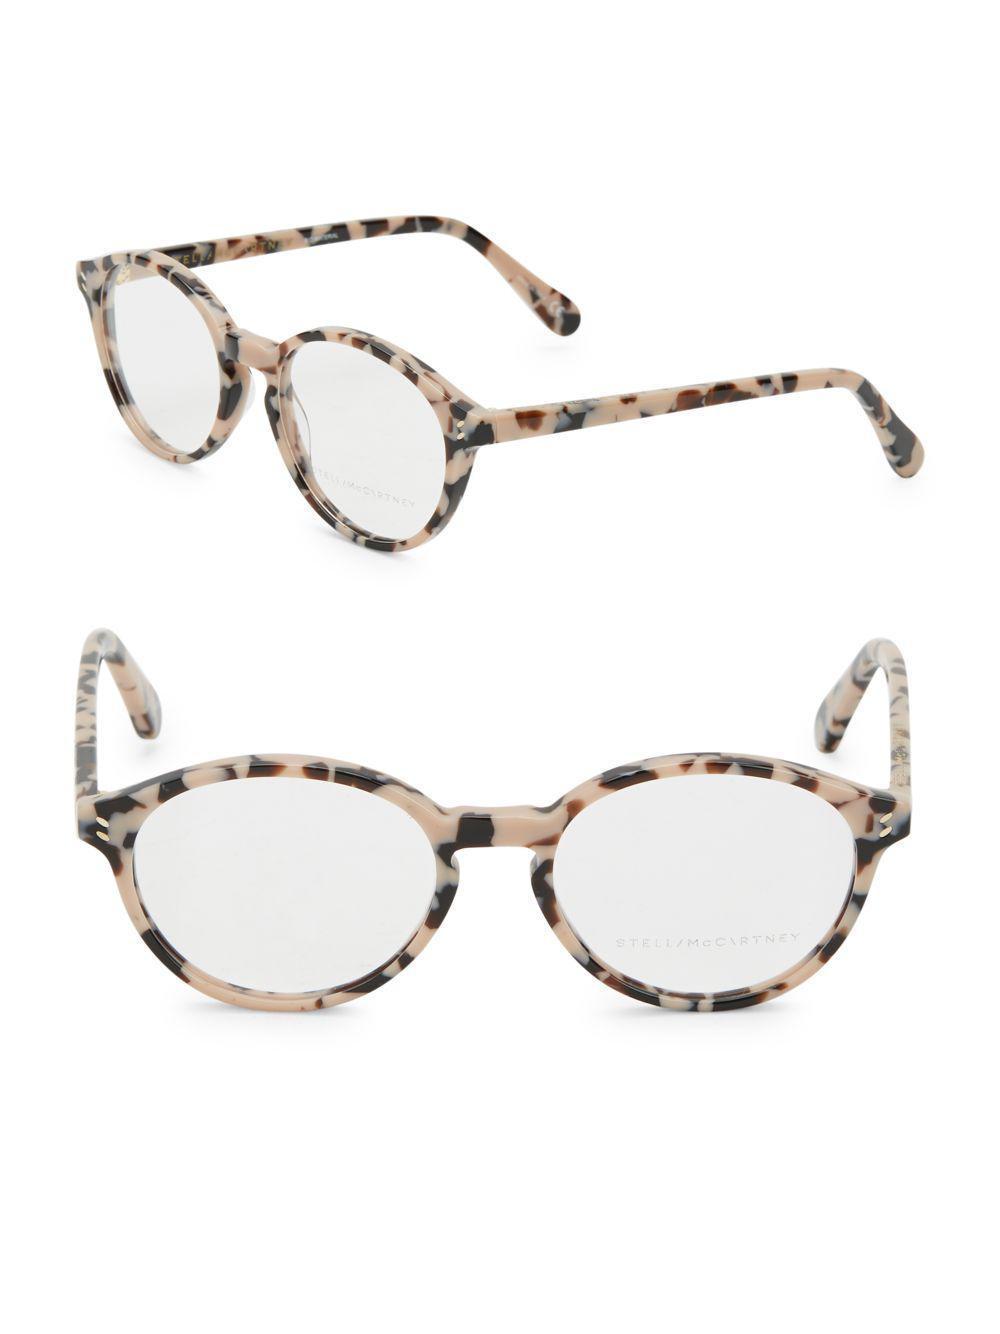 1ea7351d701 Lyst - Stella McCartney 51mm Tortoise Shell Round Optical Glasses in ...